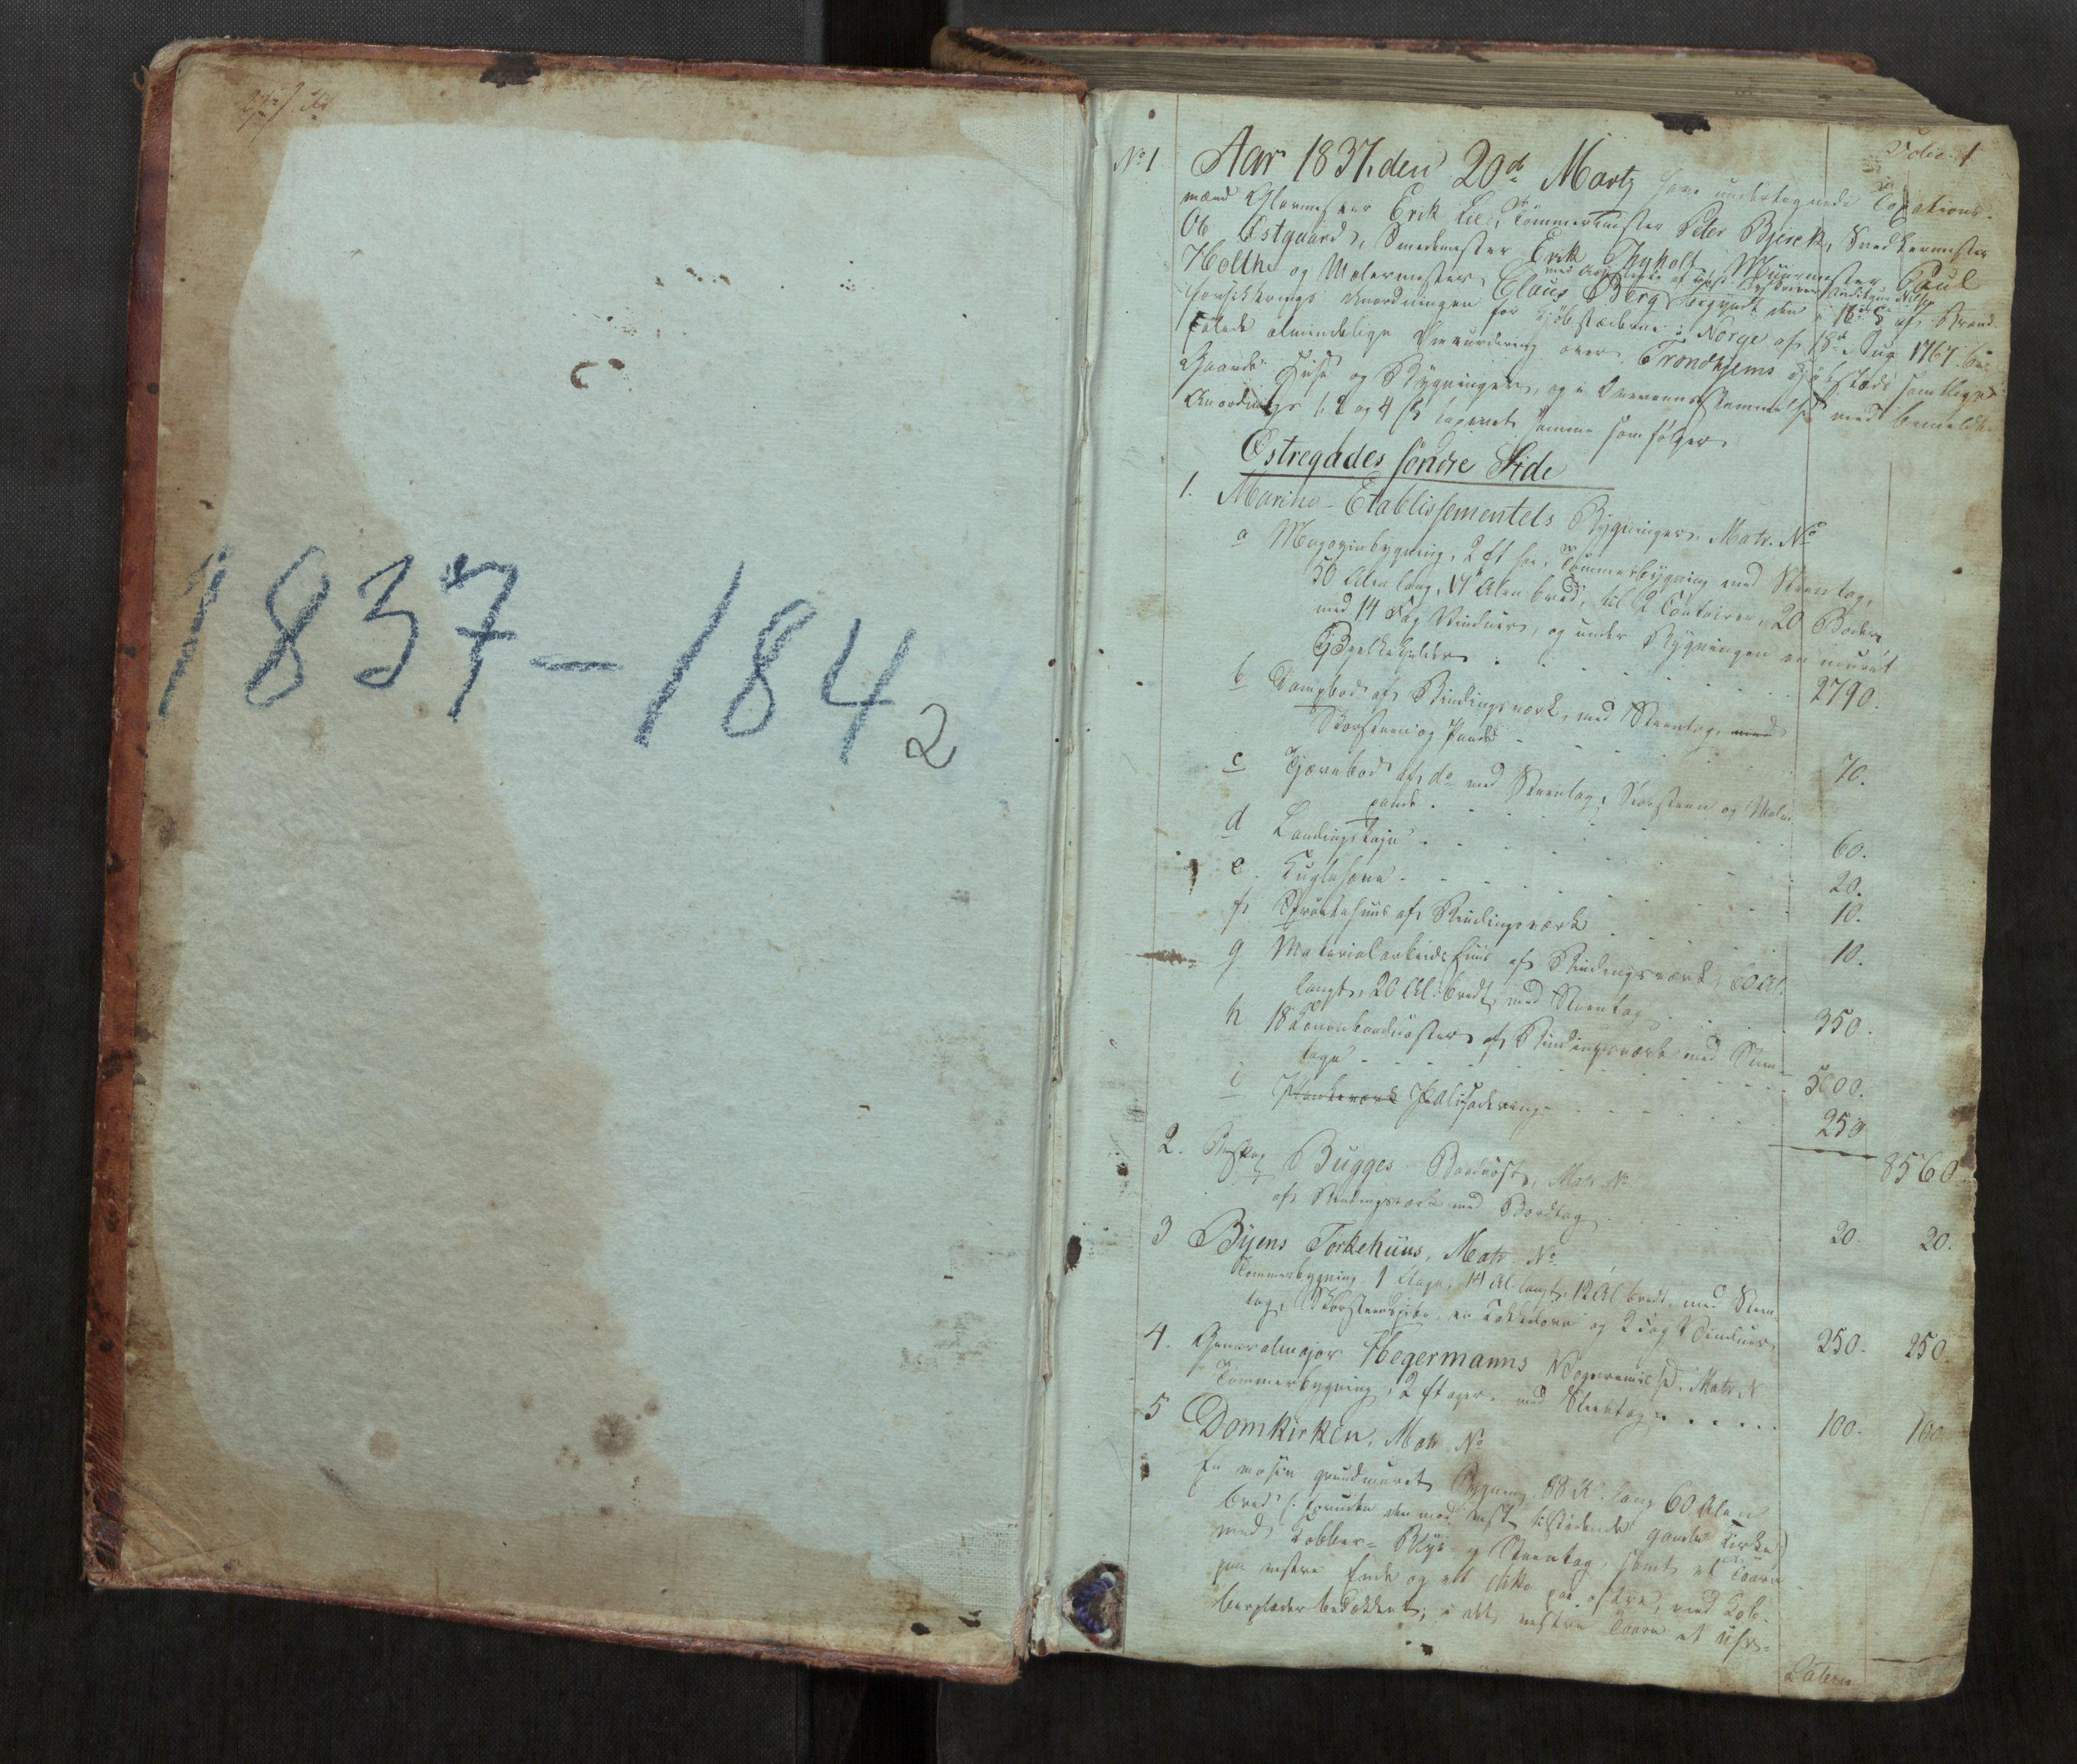 SAT, Norges Brannkasse Trondheim magistrat, Fa/L0013: Branntakstprotokoll K15, 1837-1842, s. 1